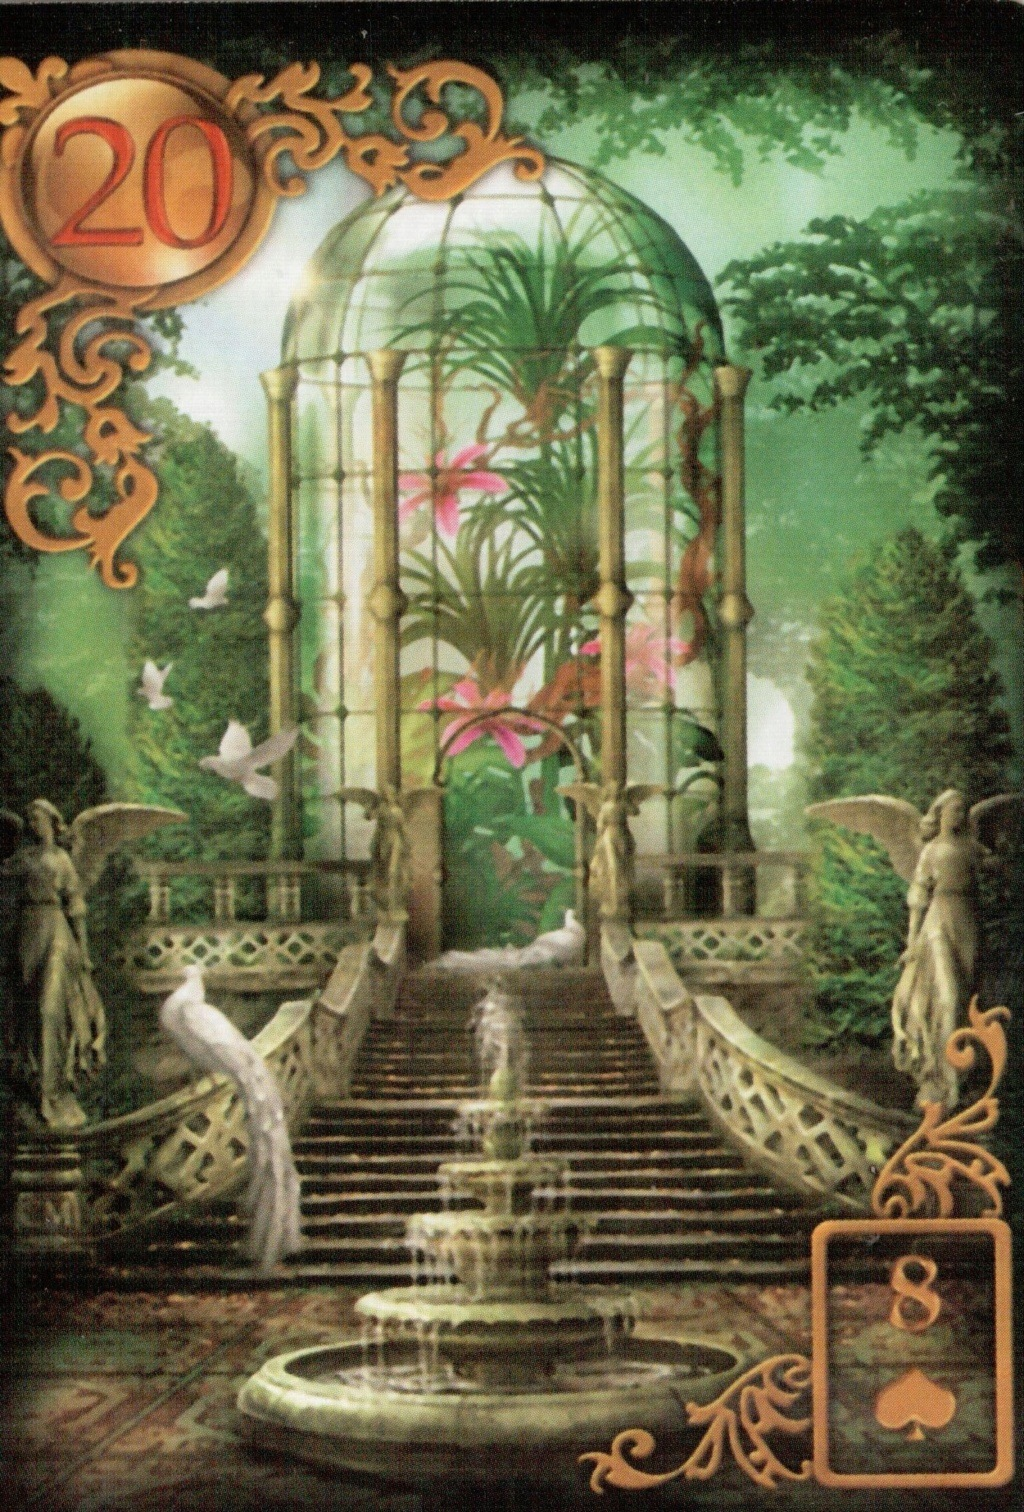 Золотые мечты Ленорман (Расширенное издание) | Gilded Reverie Lenormand. Галерея.  20_a10